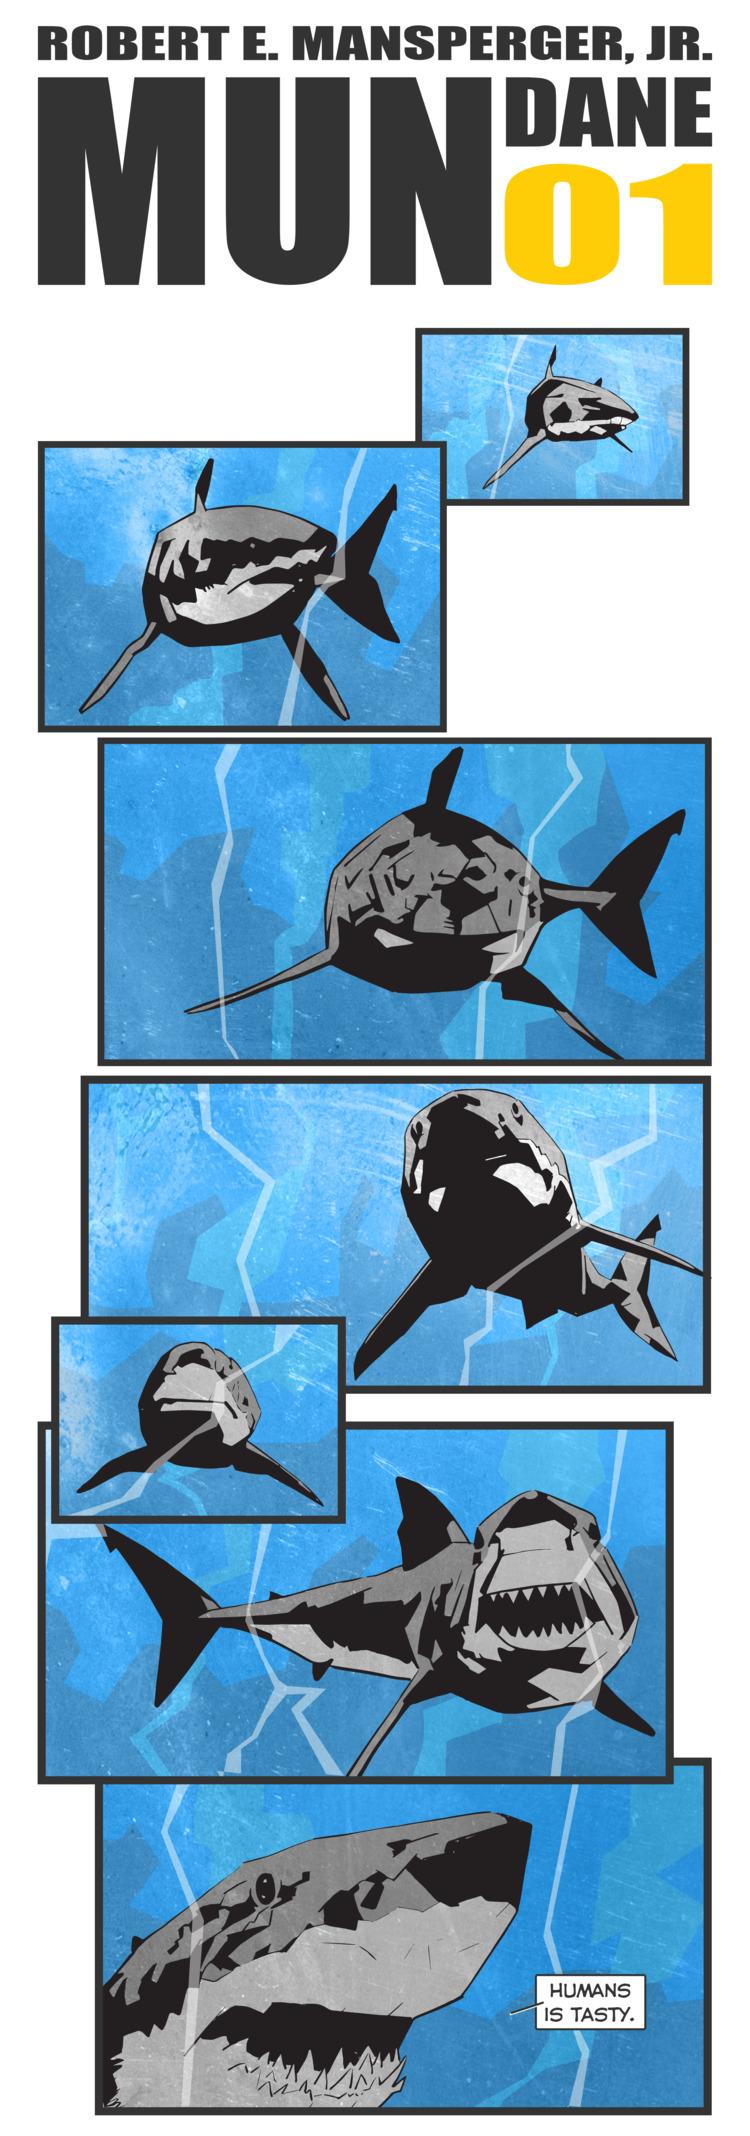 MUNDANE 01 comic strip - rmansperger   ello